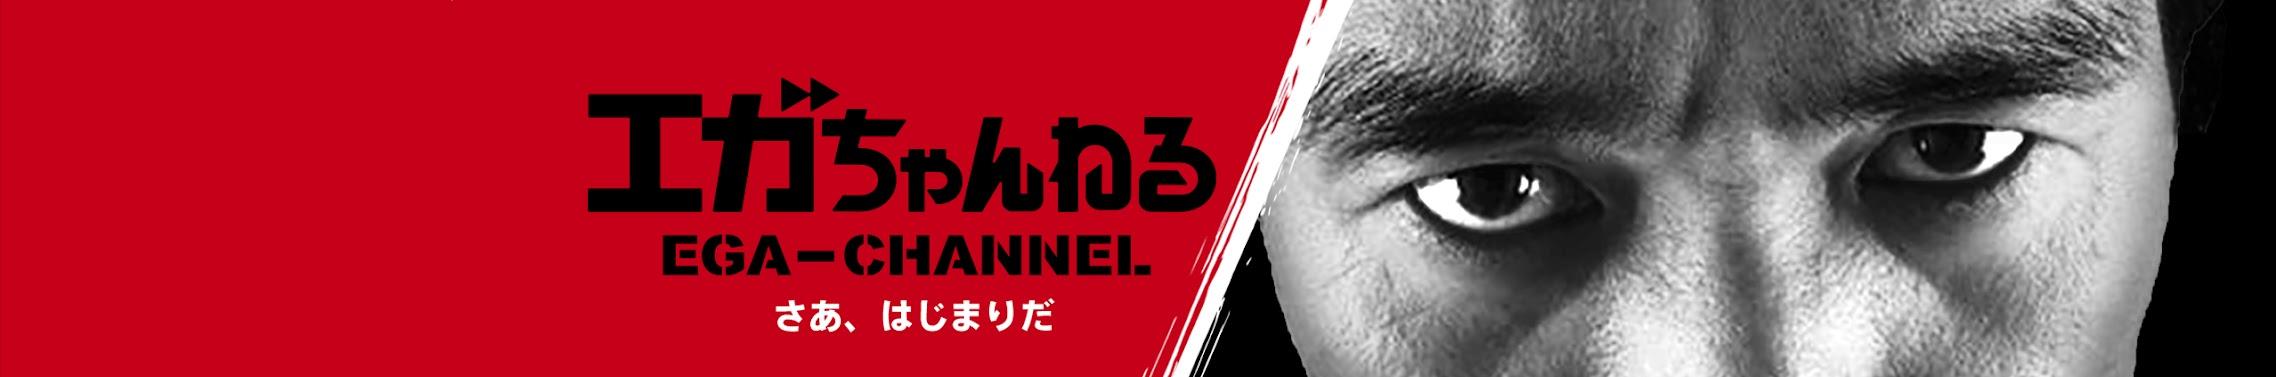 Ega channel ちゃんねる エガ